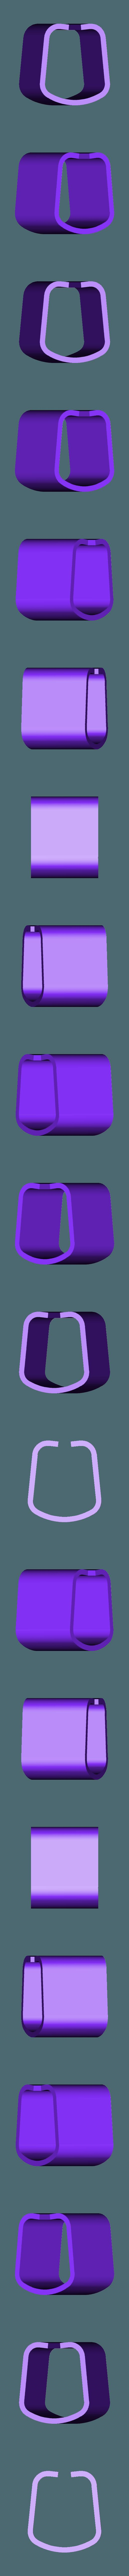 Bar_Clip_v1-1_Small.STL Télécharger fichier STL gratuit Clips de fraisage RigidBot • Plan imprimable en 3D, WalterHsiao